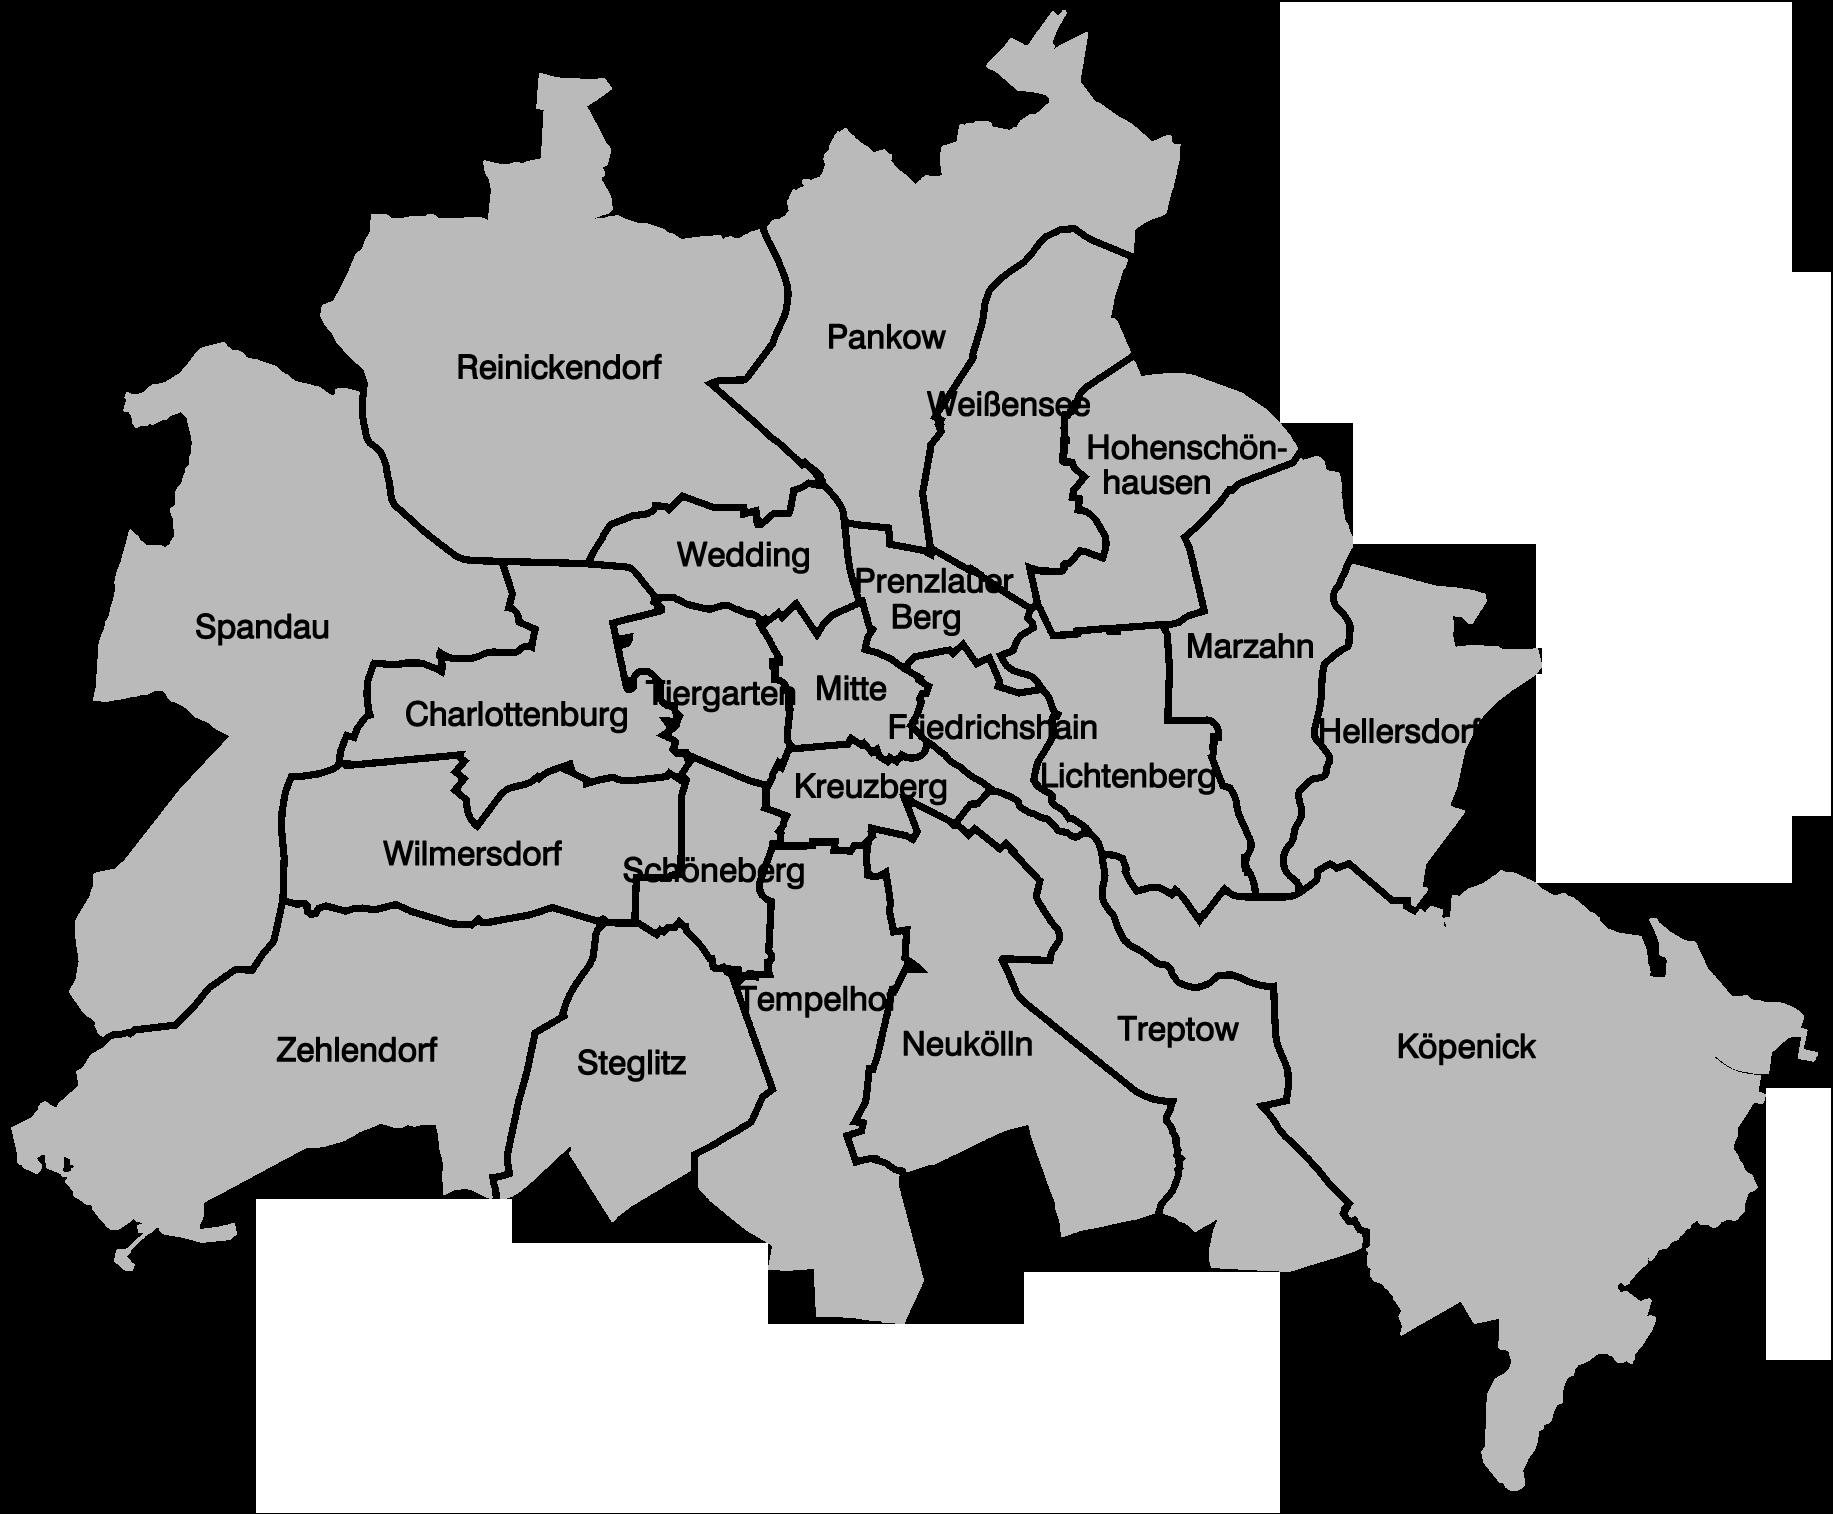 http://upload.wikimedia.org/wikipedia/commons/0/0b/Berliner_Bezirke_vor_2001.png